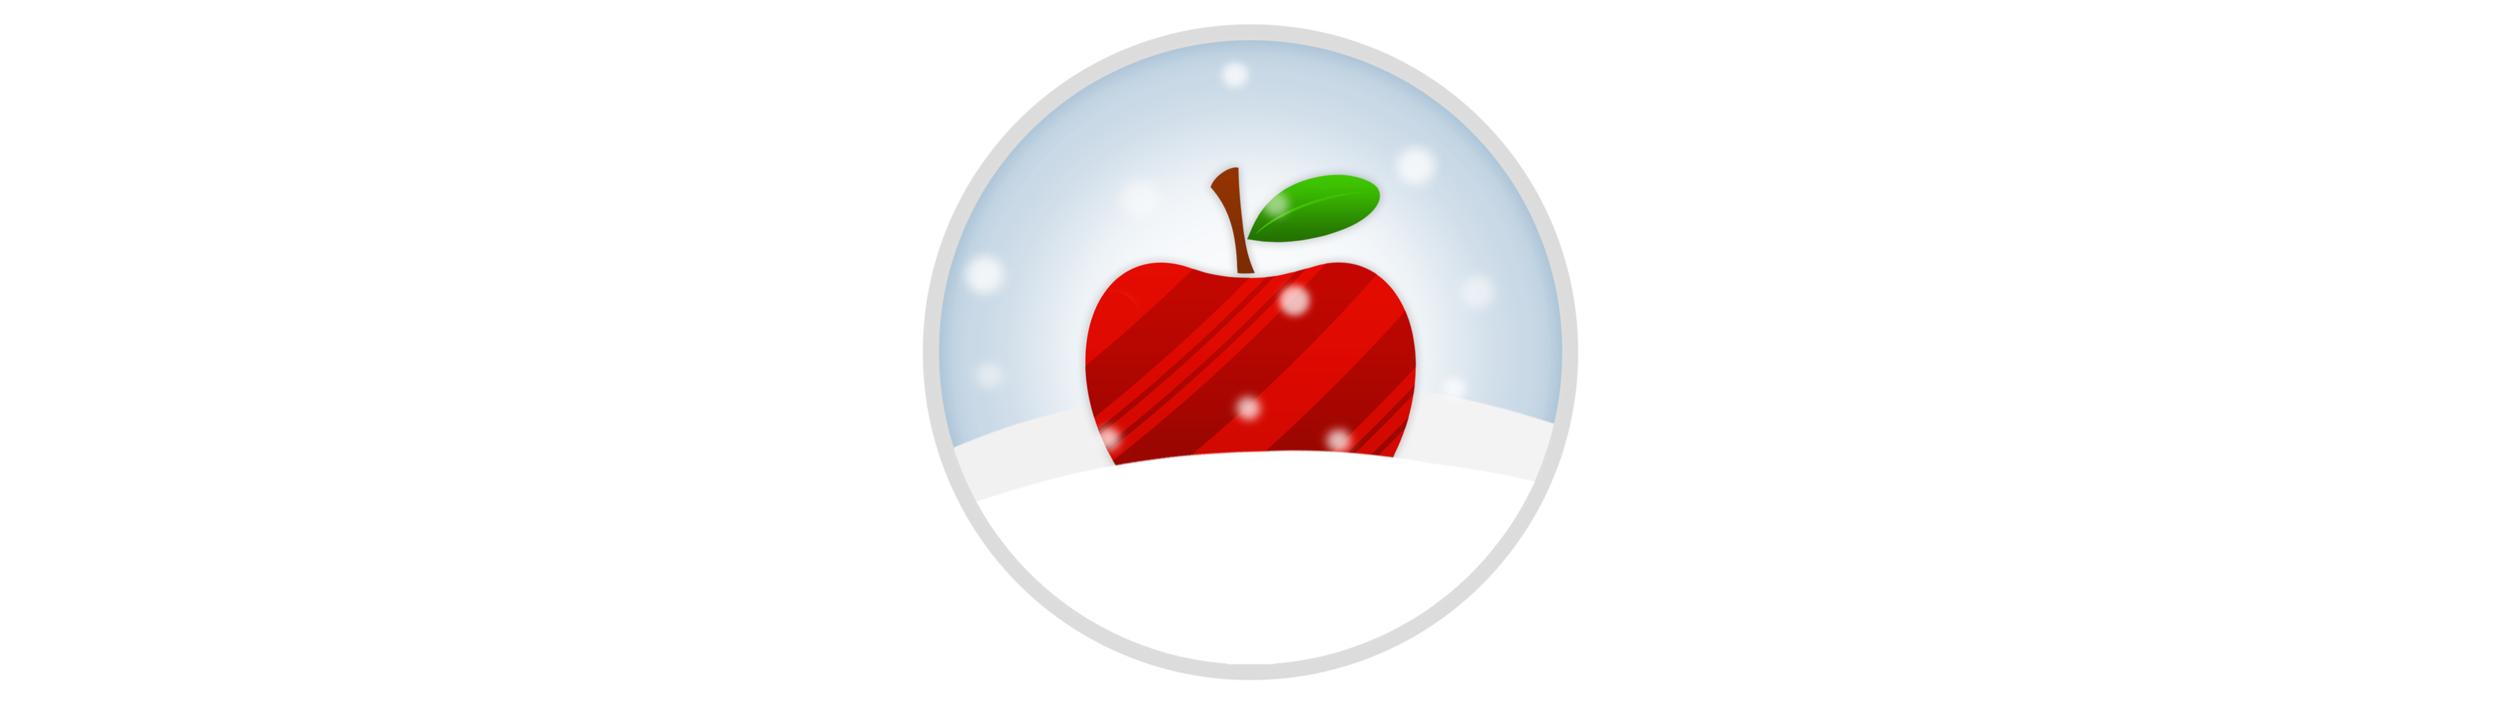 apple-tree-learning-center-glendale-news-12.png